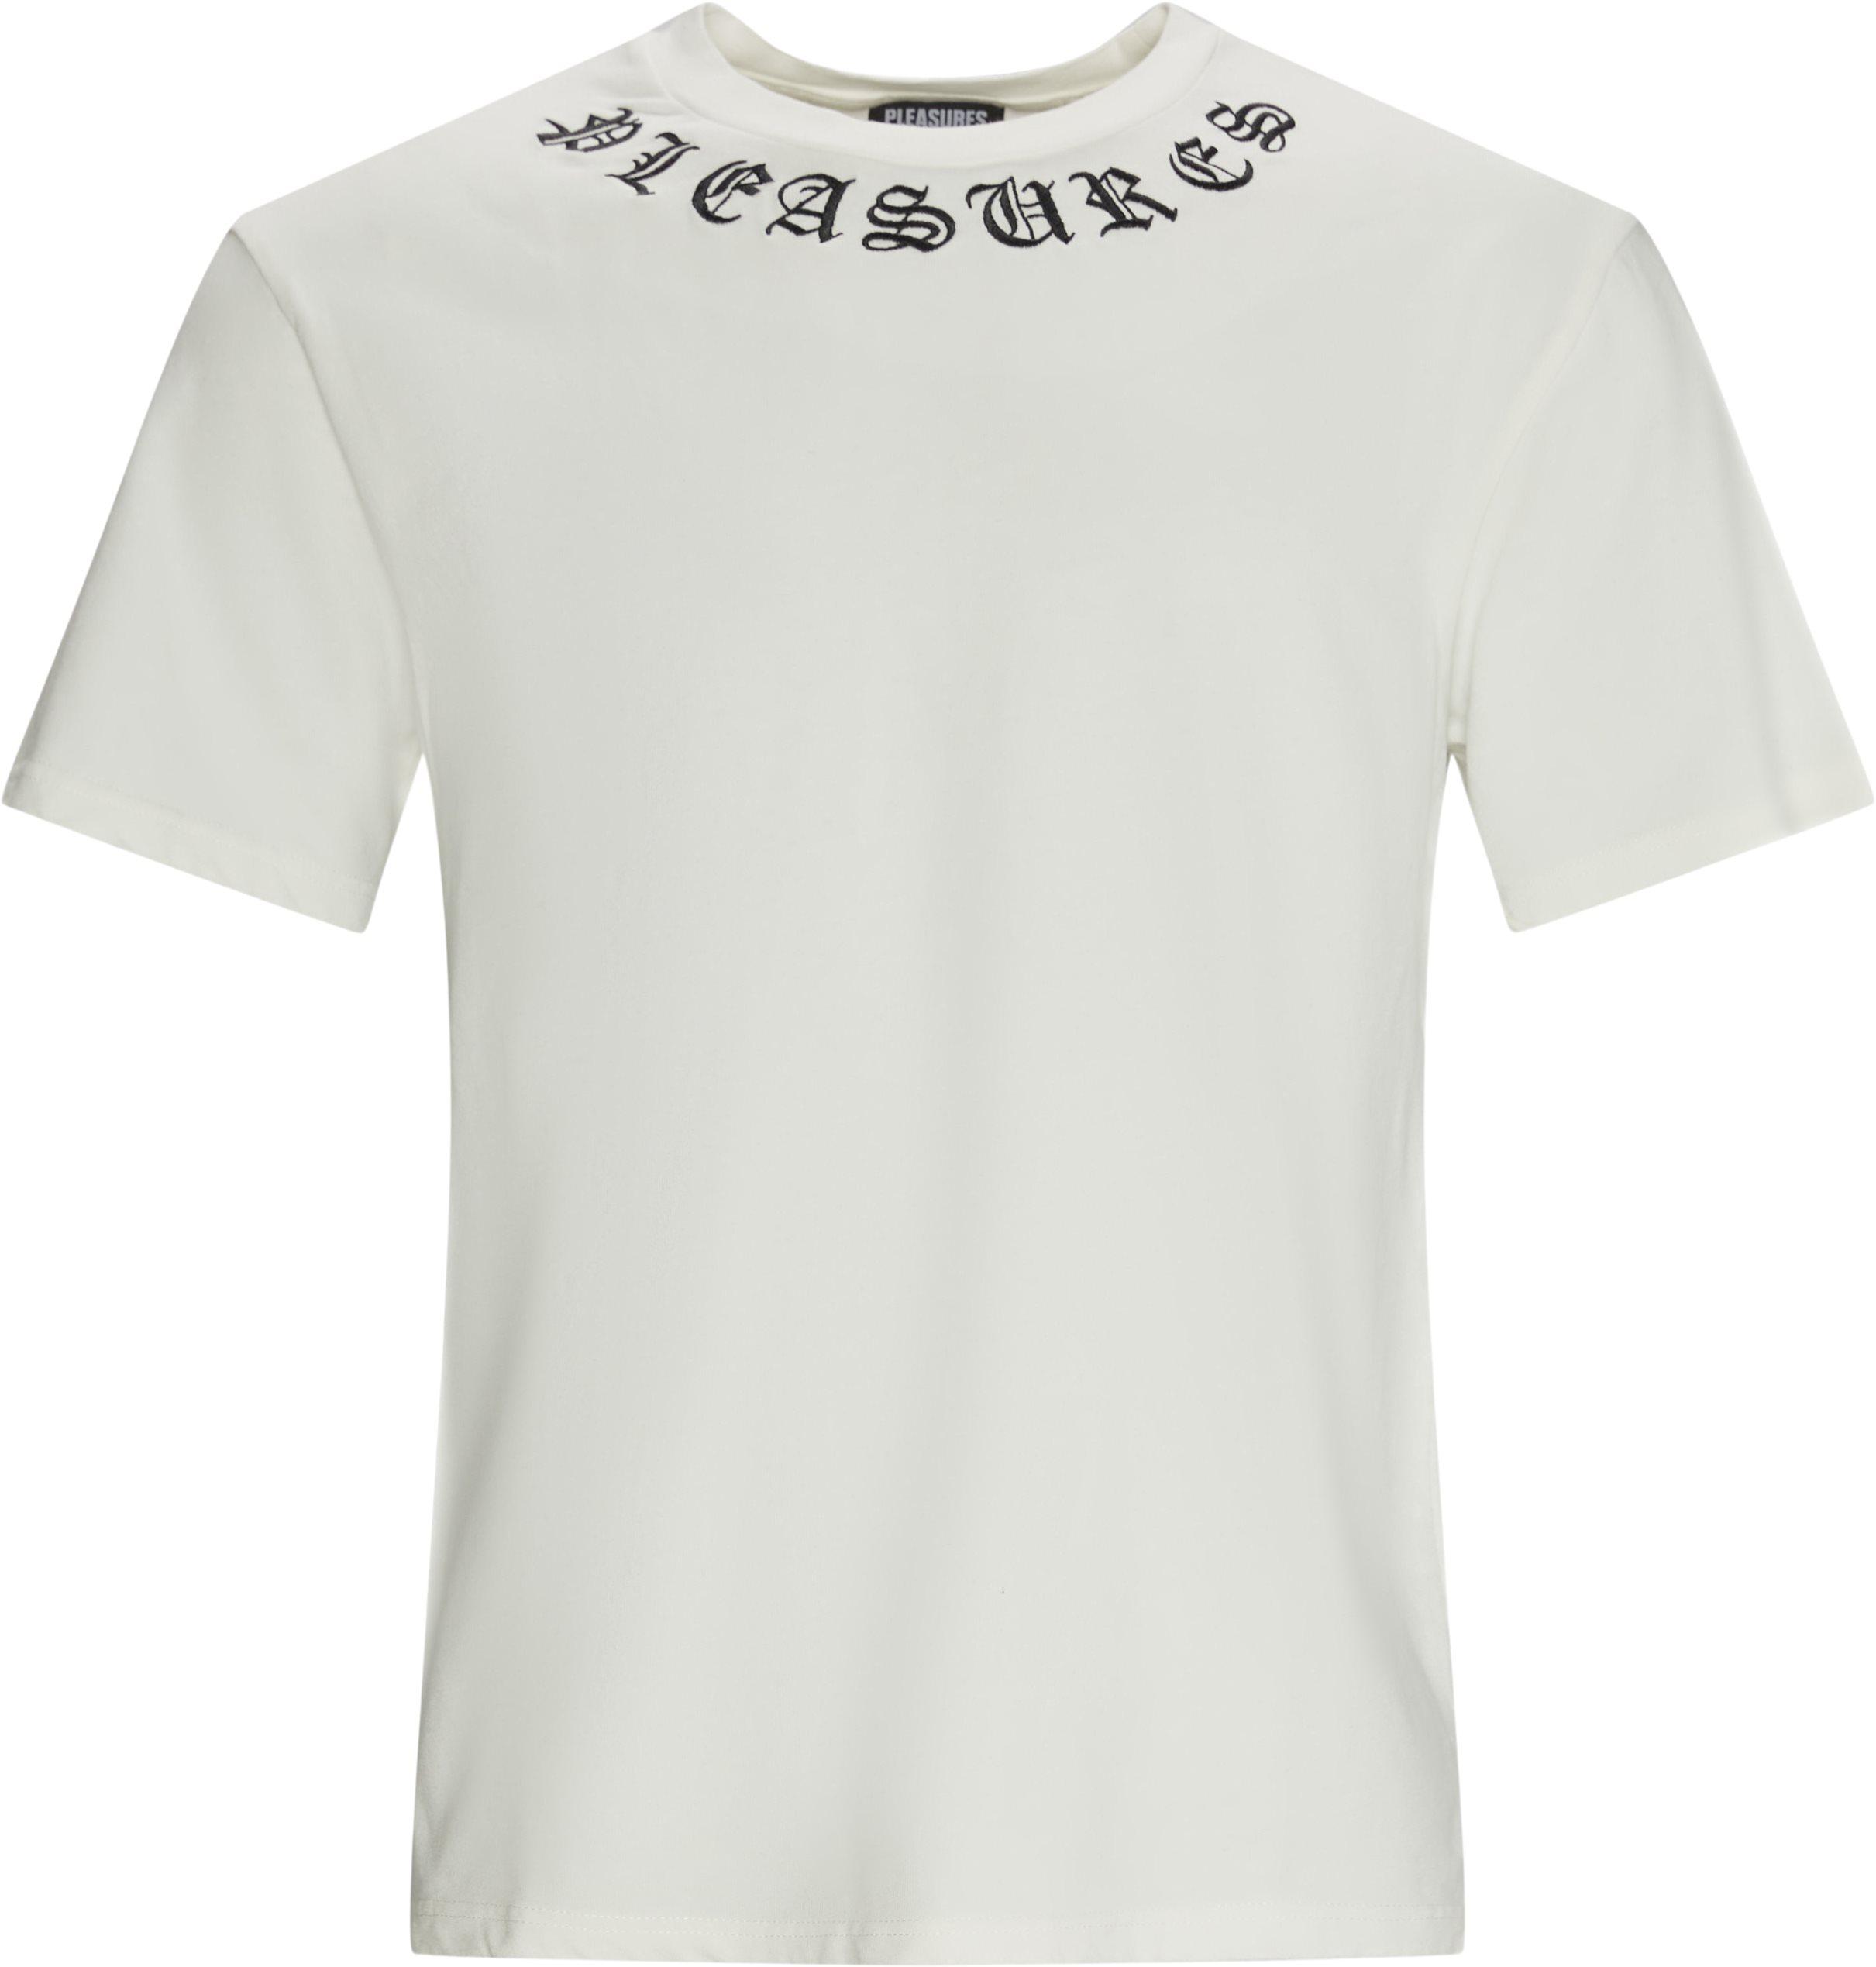 Memento Heavy T-shirt - T-shirts - Regular fit - Hvid